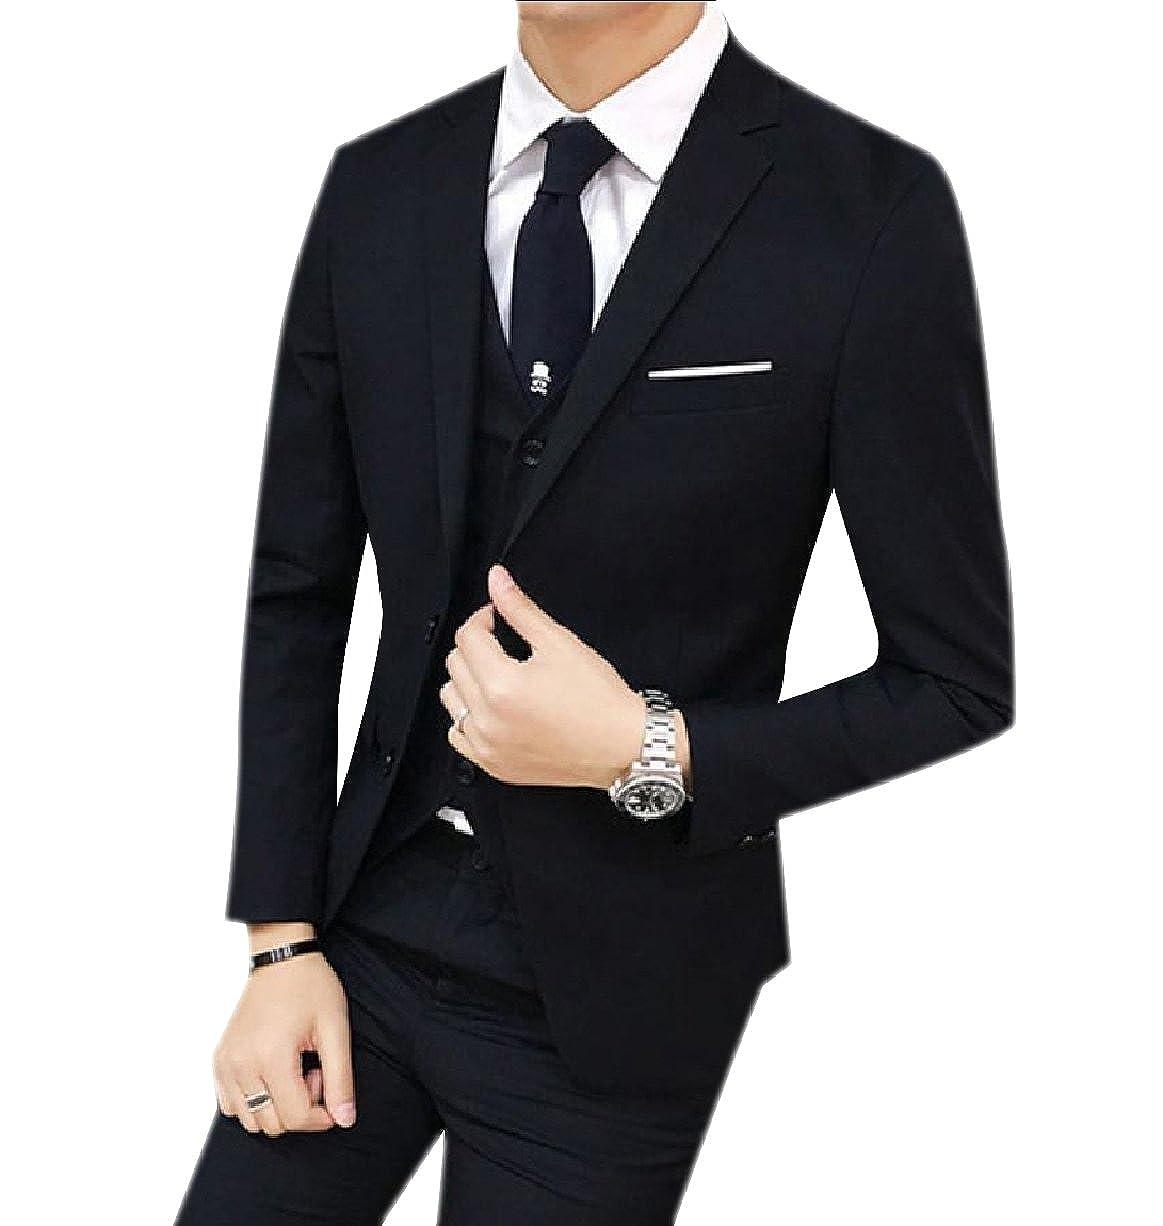 Black Tootless-Men Set 3-Piece Slim Fit Fit Fit Wedding Tuxedo Two-Button Business Suit 54a3ad